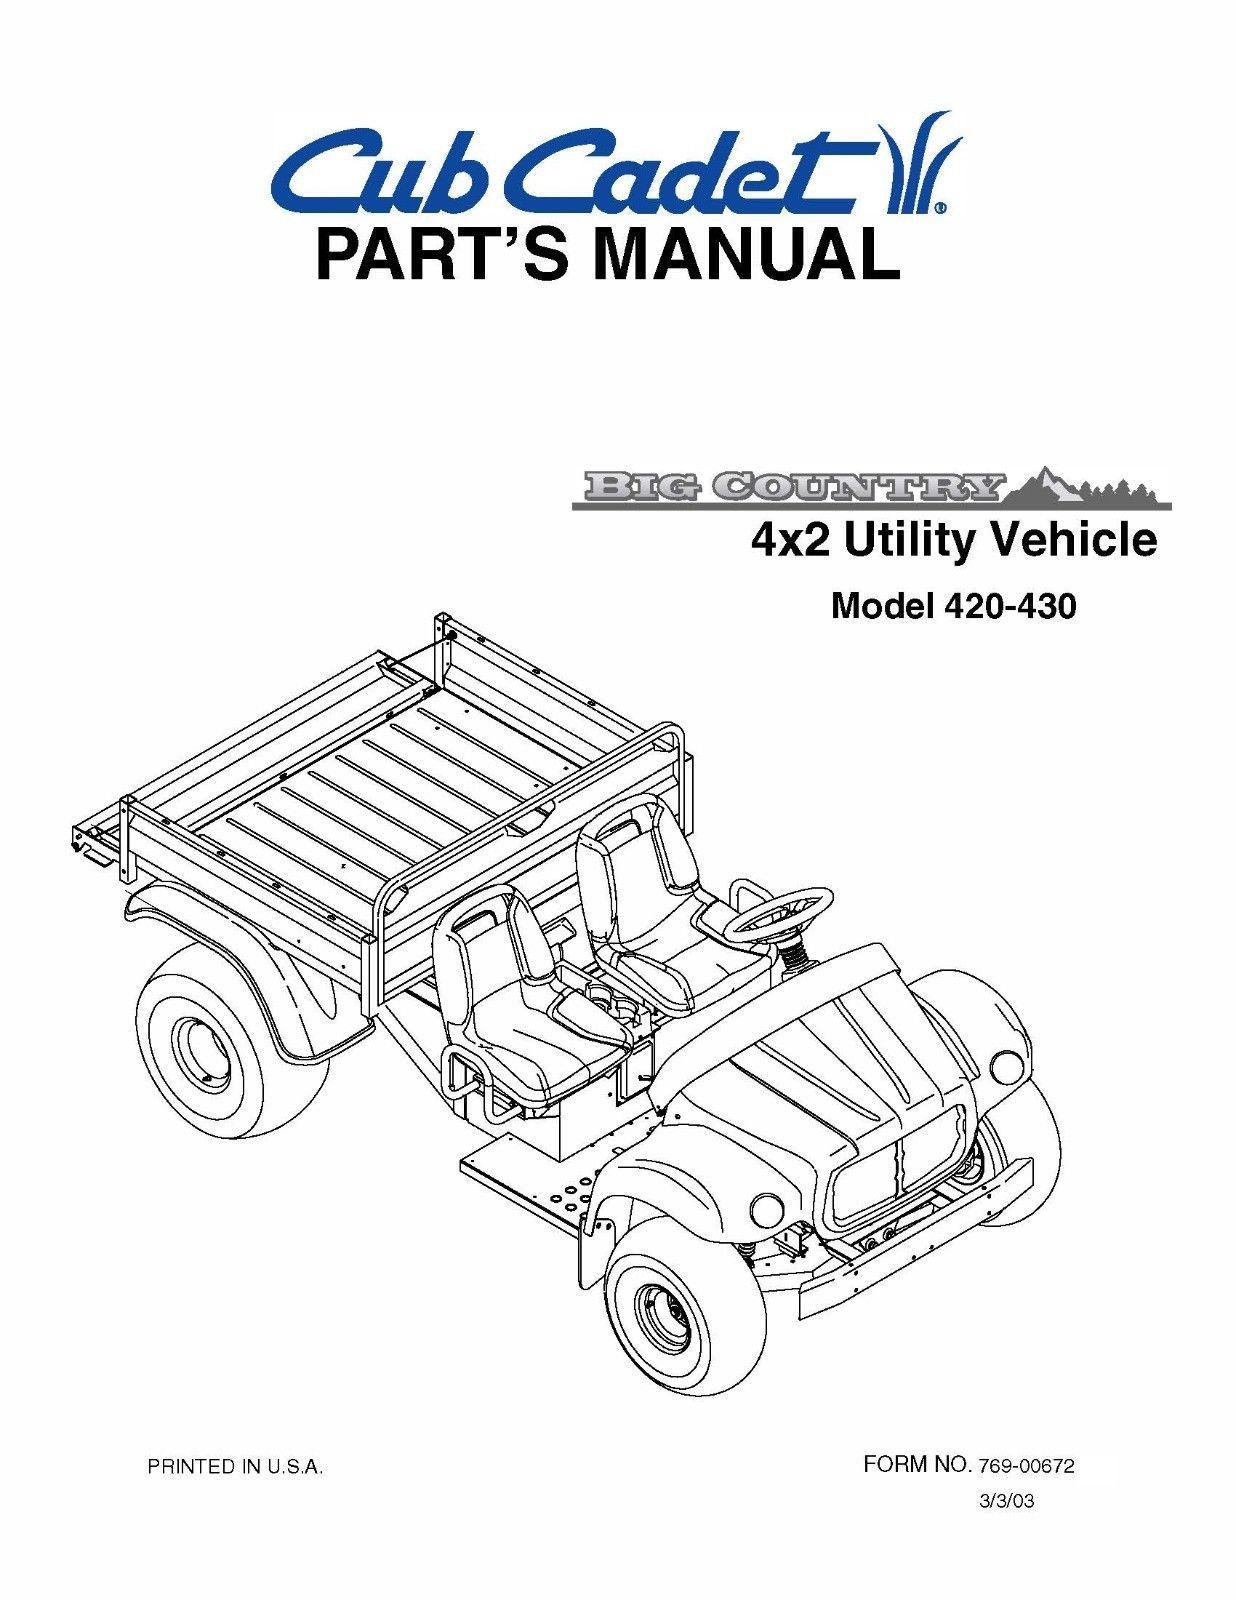 Cub Cadet Big Country 4x2 utility vehicle Parts Manual No